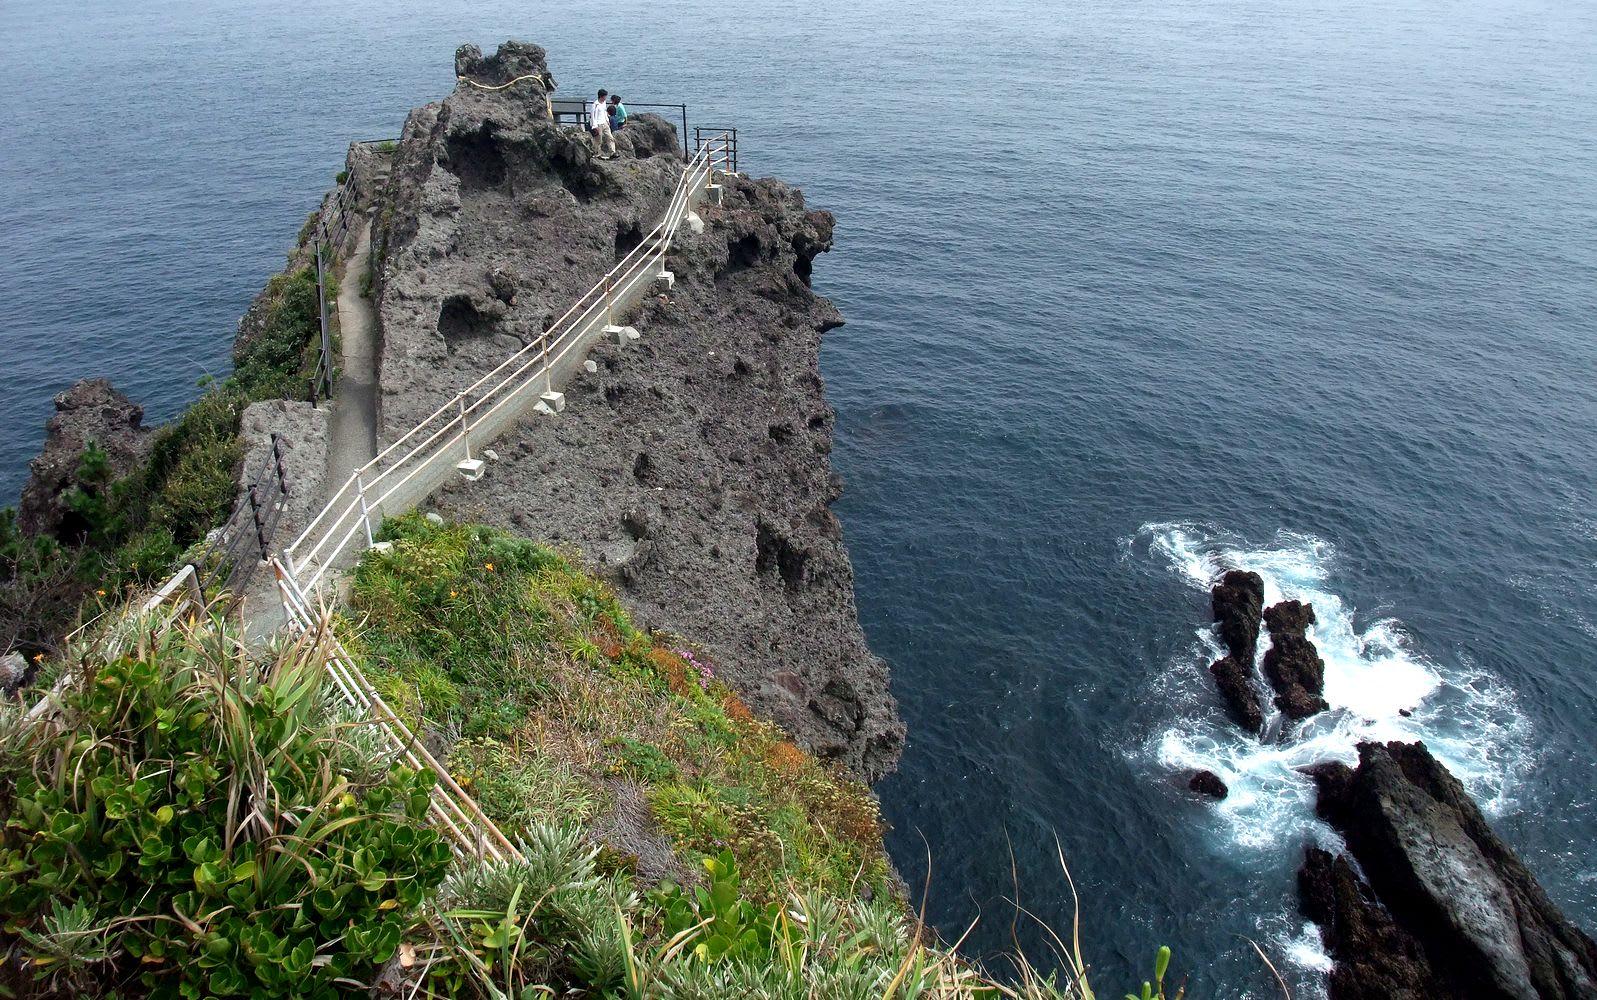 http://blogimg.goo.ne.jp/user_image/74/11/30ea0f474870f9d1ff55786b664c9254.jpg